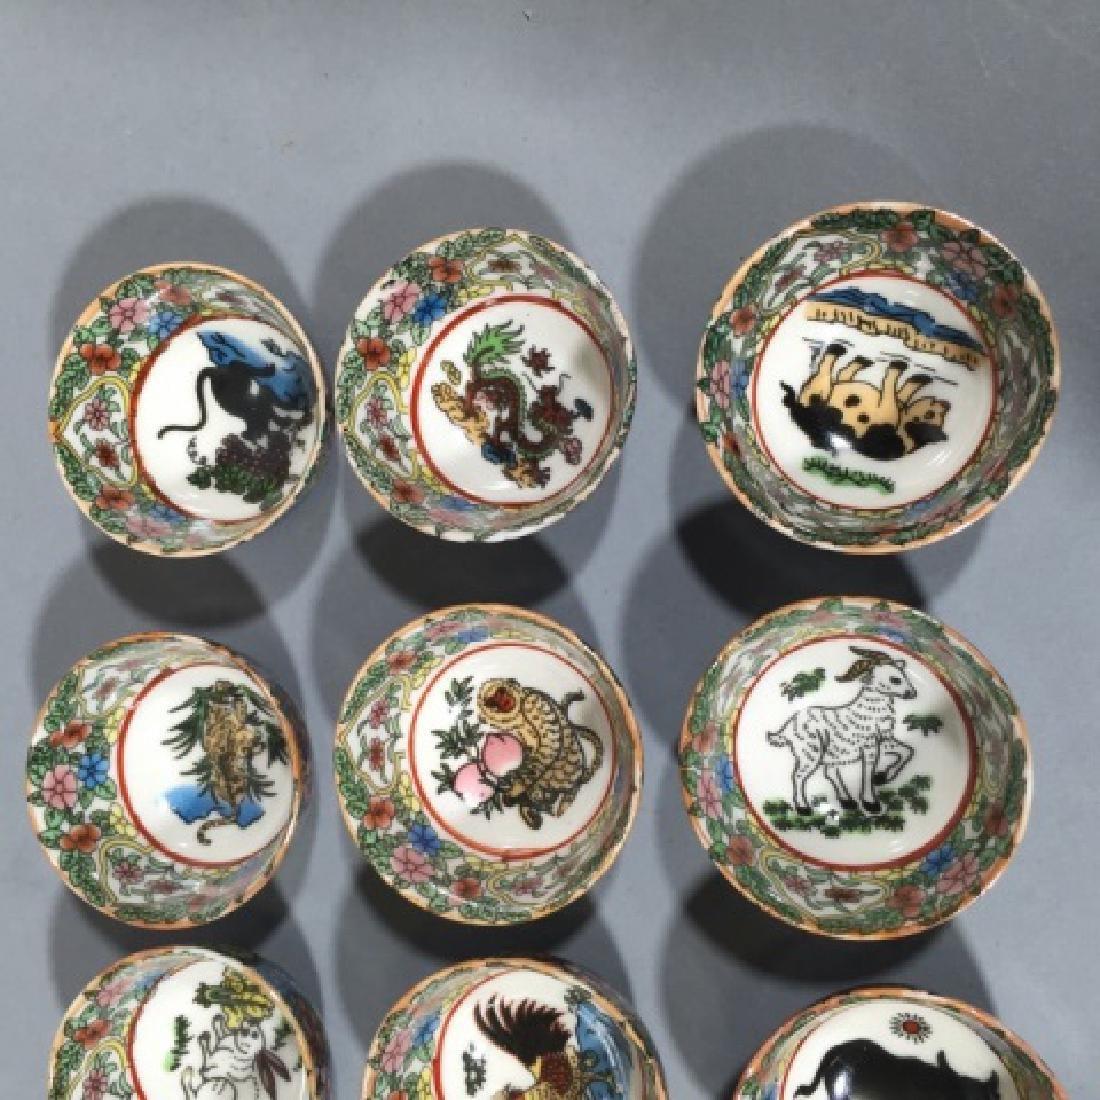 Set of 12 Chinese Porcelain Zodiac Tea Cups - 4